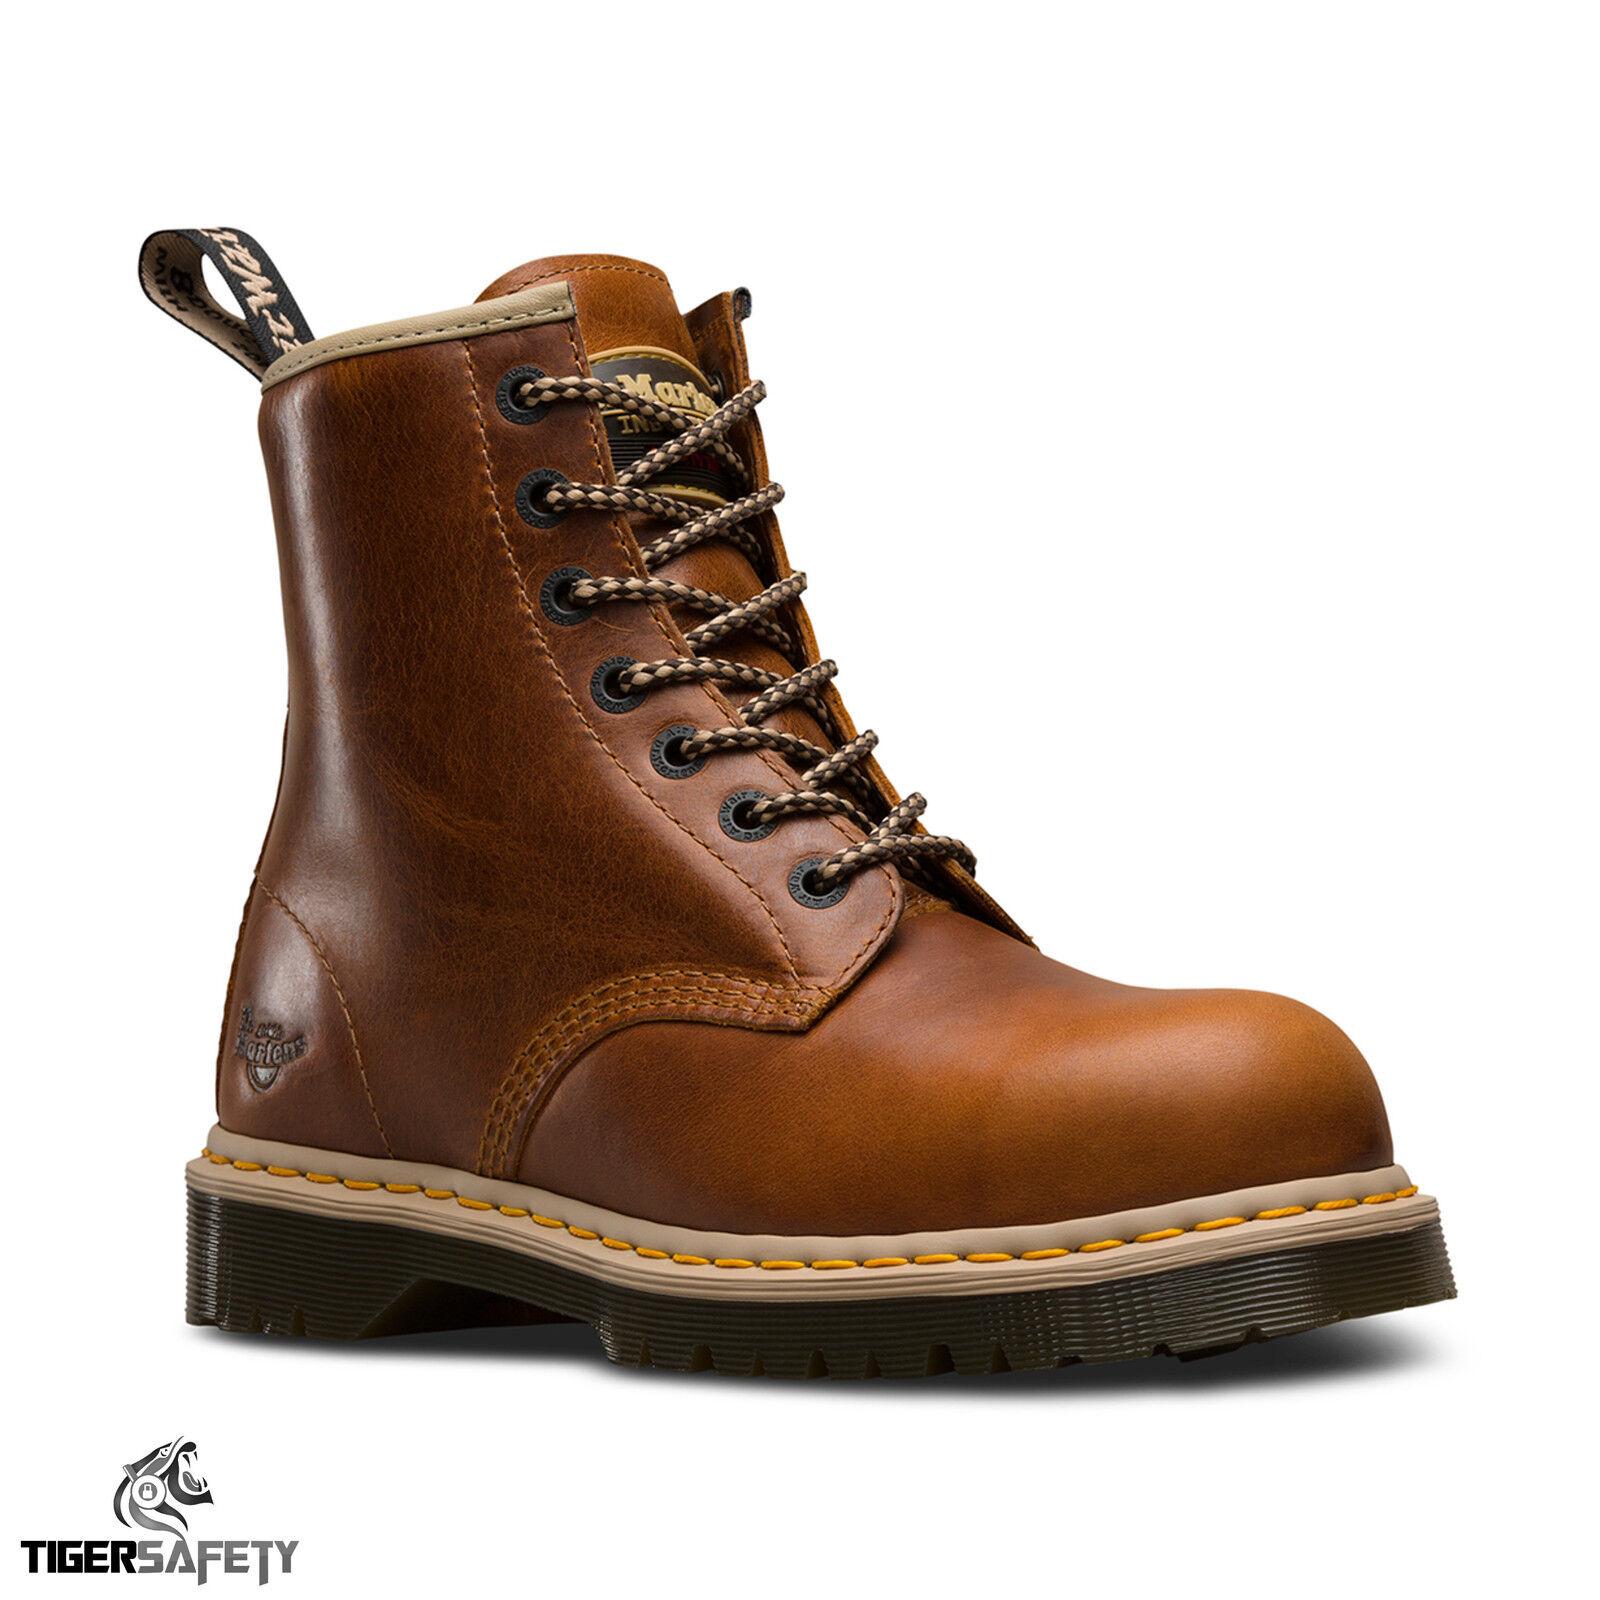 Dr Martens DM Docs Icon 7B10 Tan Steel Toe Cap 7 Eyelet Heavy Duty Safety Stiefel